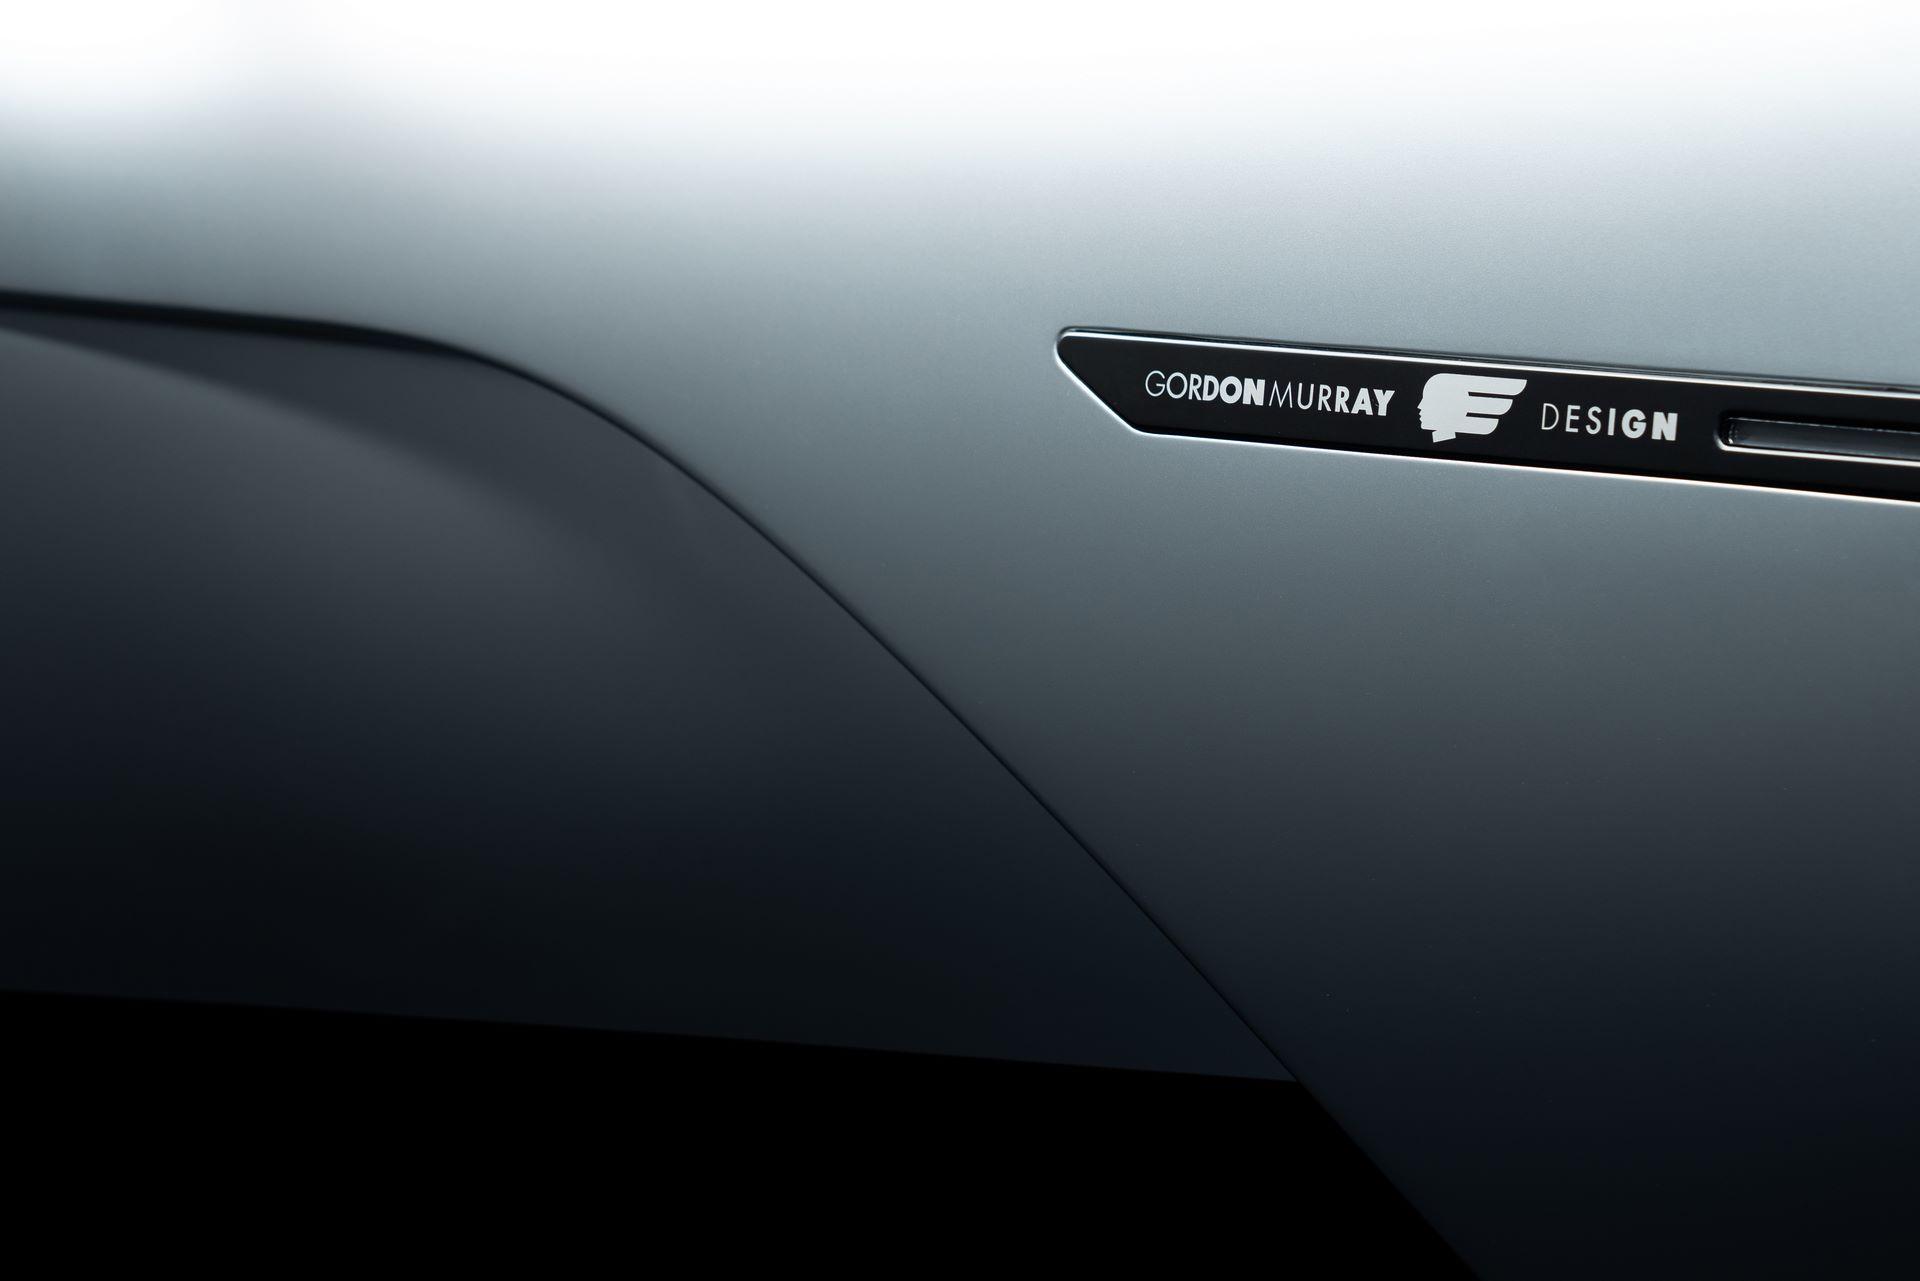 Gordon-Murray-Automotive-GMA-T50-44